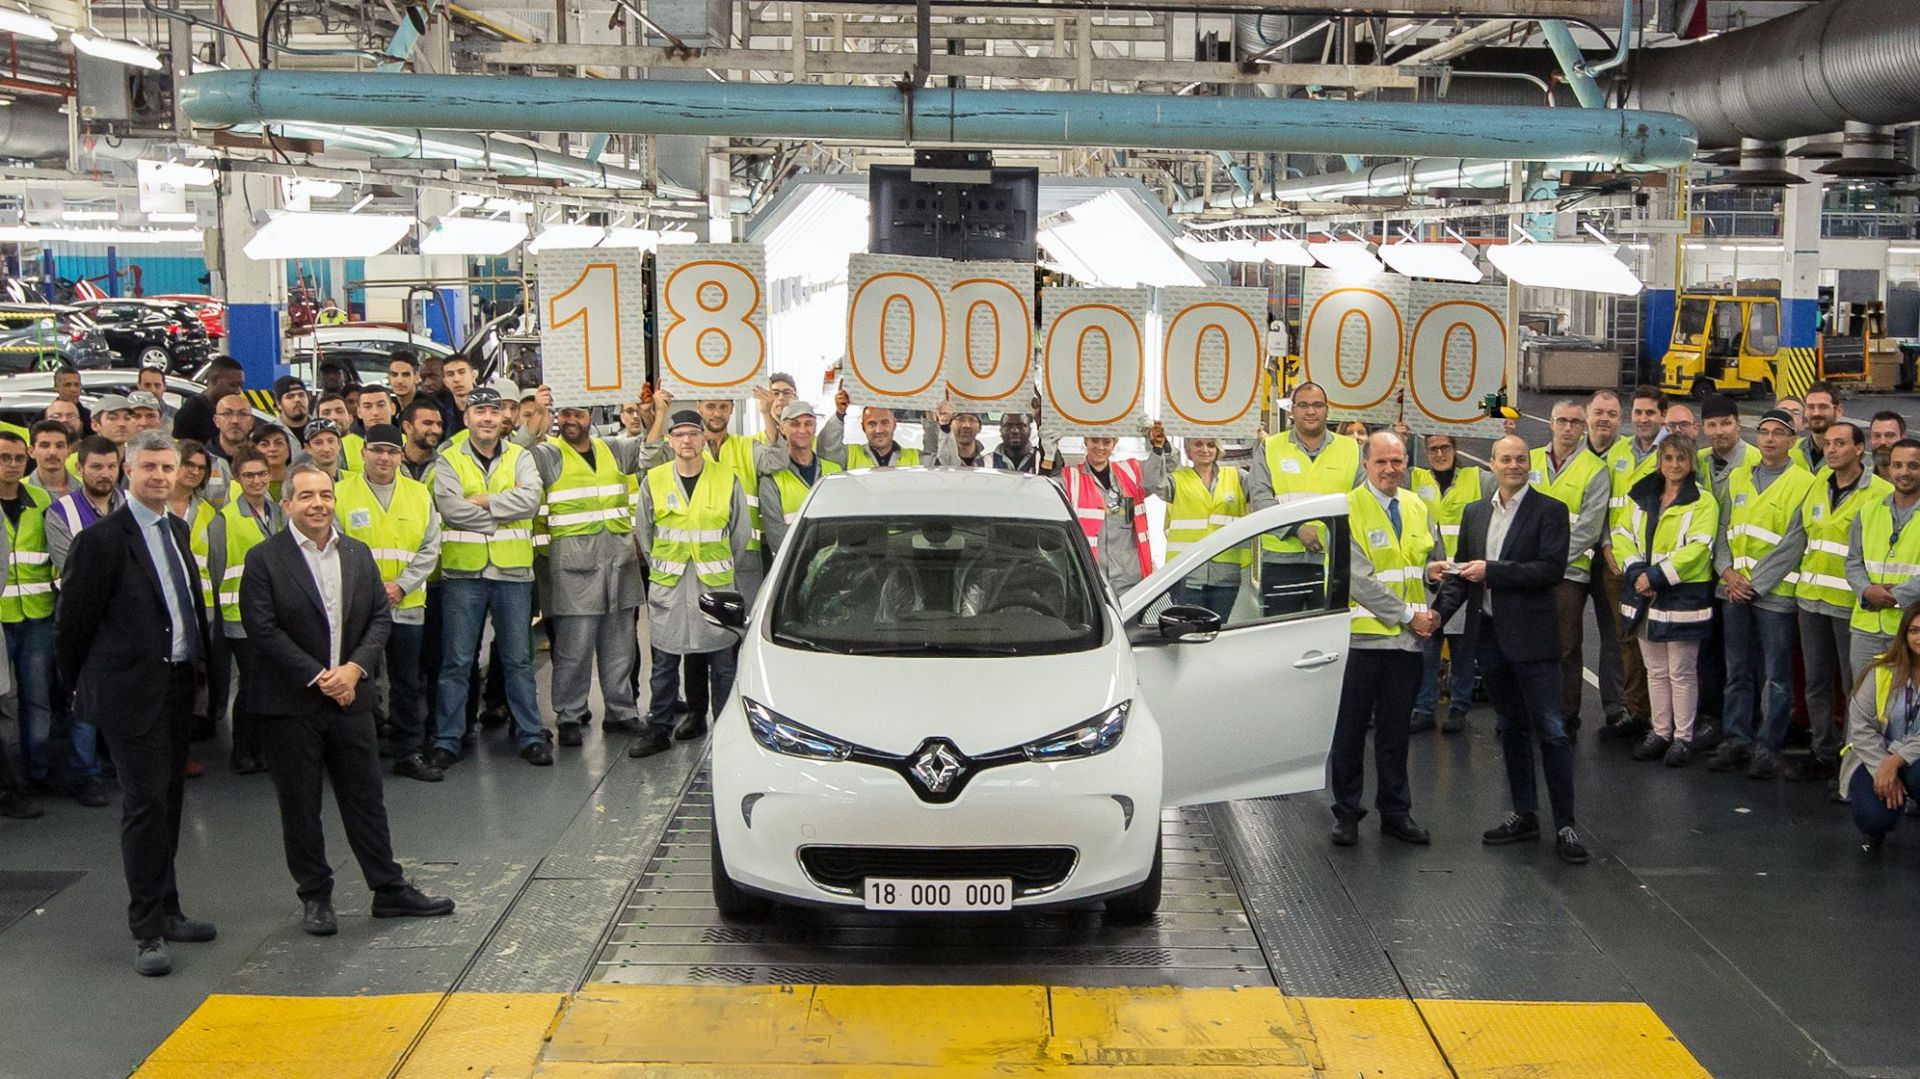 Fabryka Renault - pracownicy (ZOE)